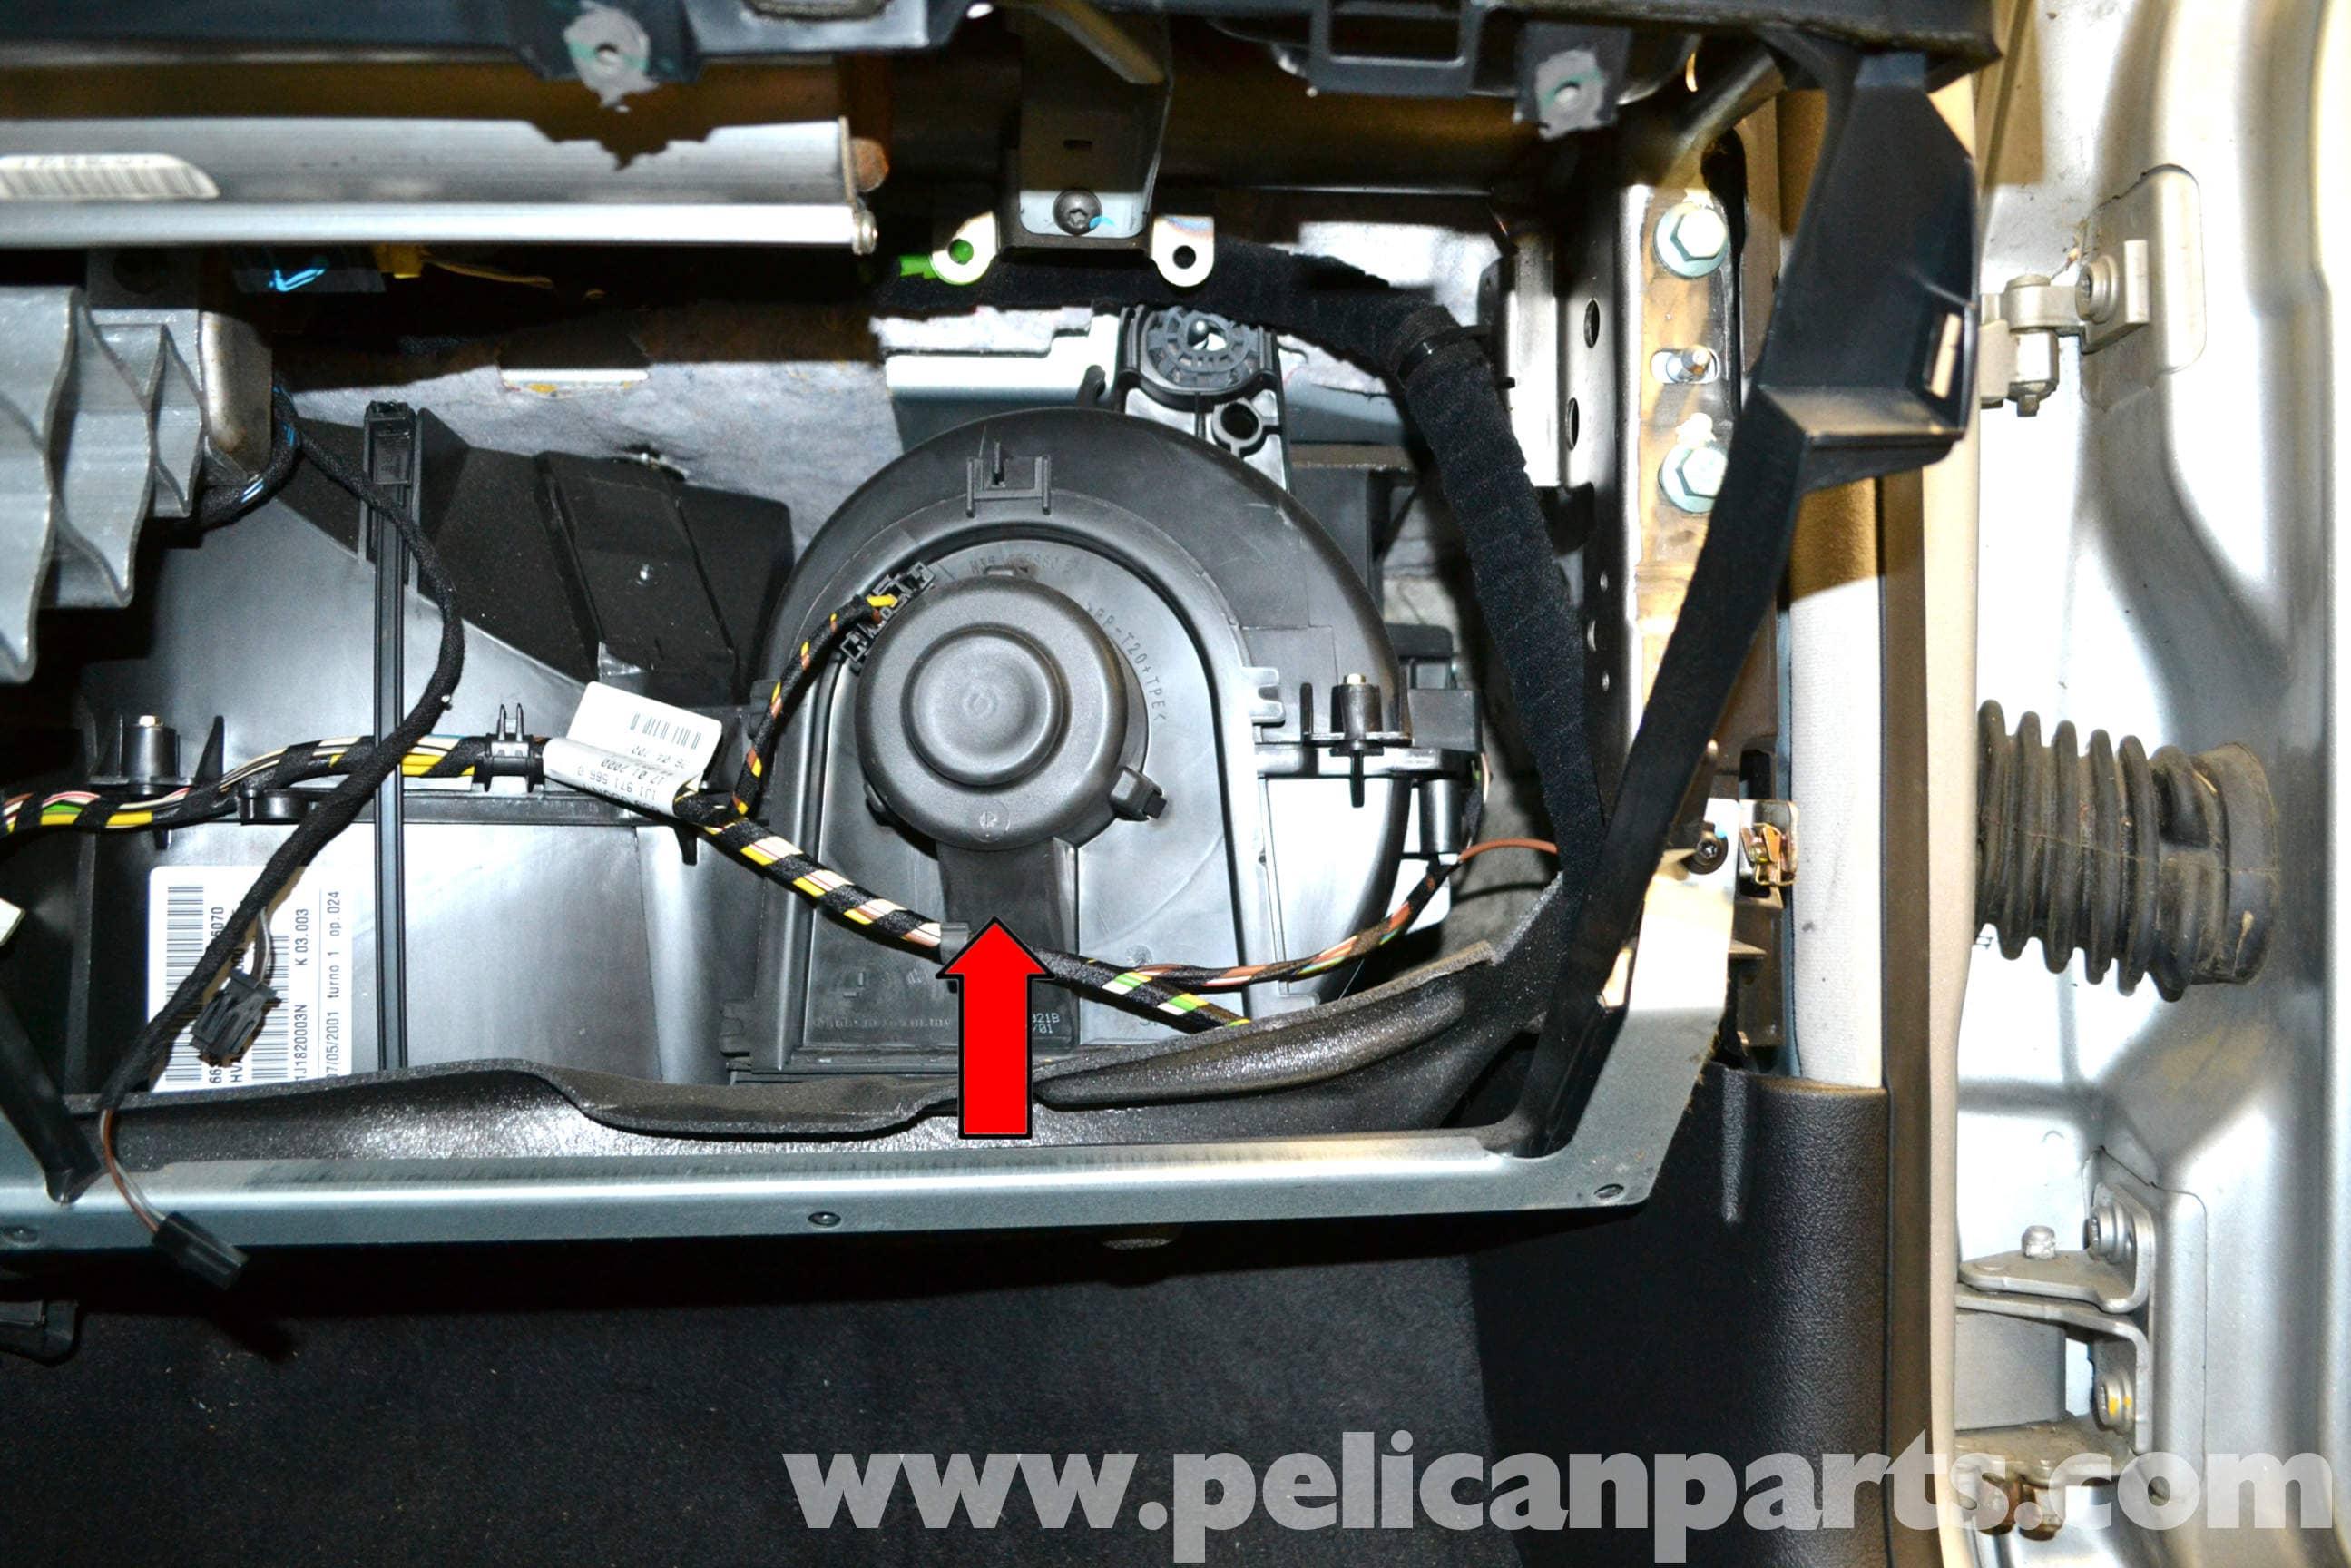 2003 Vw Jetta Wiring Diagram Volkswagen Golf Gti Mk Iv Blower Motor And Resistor